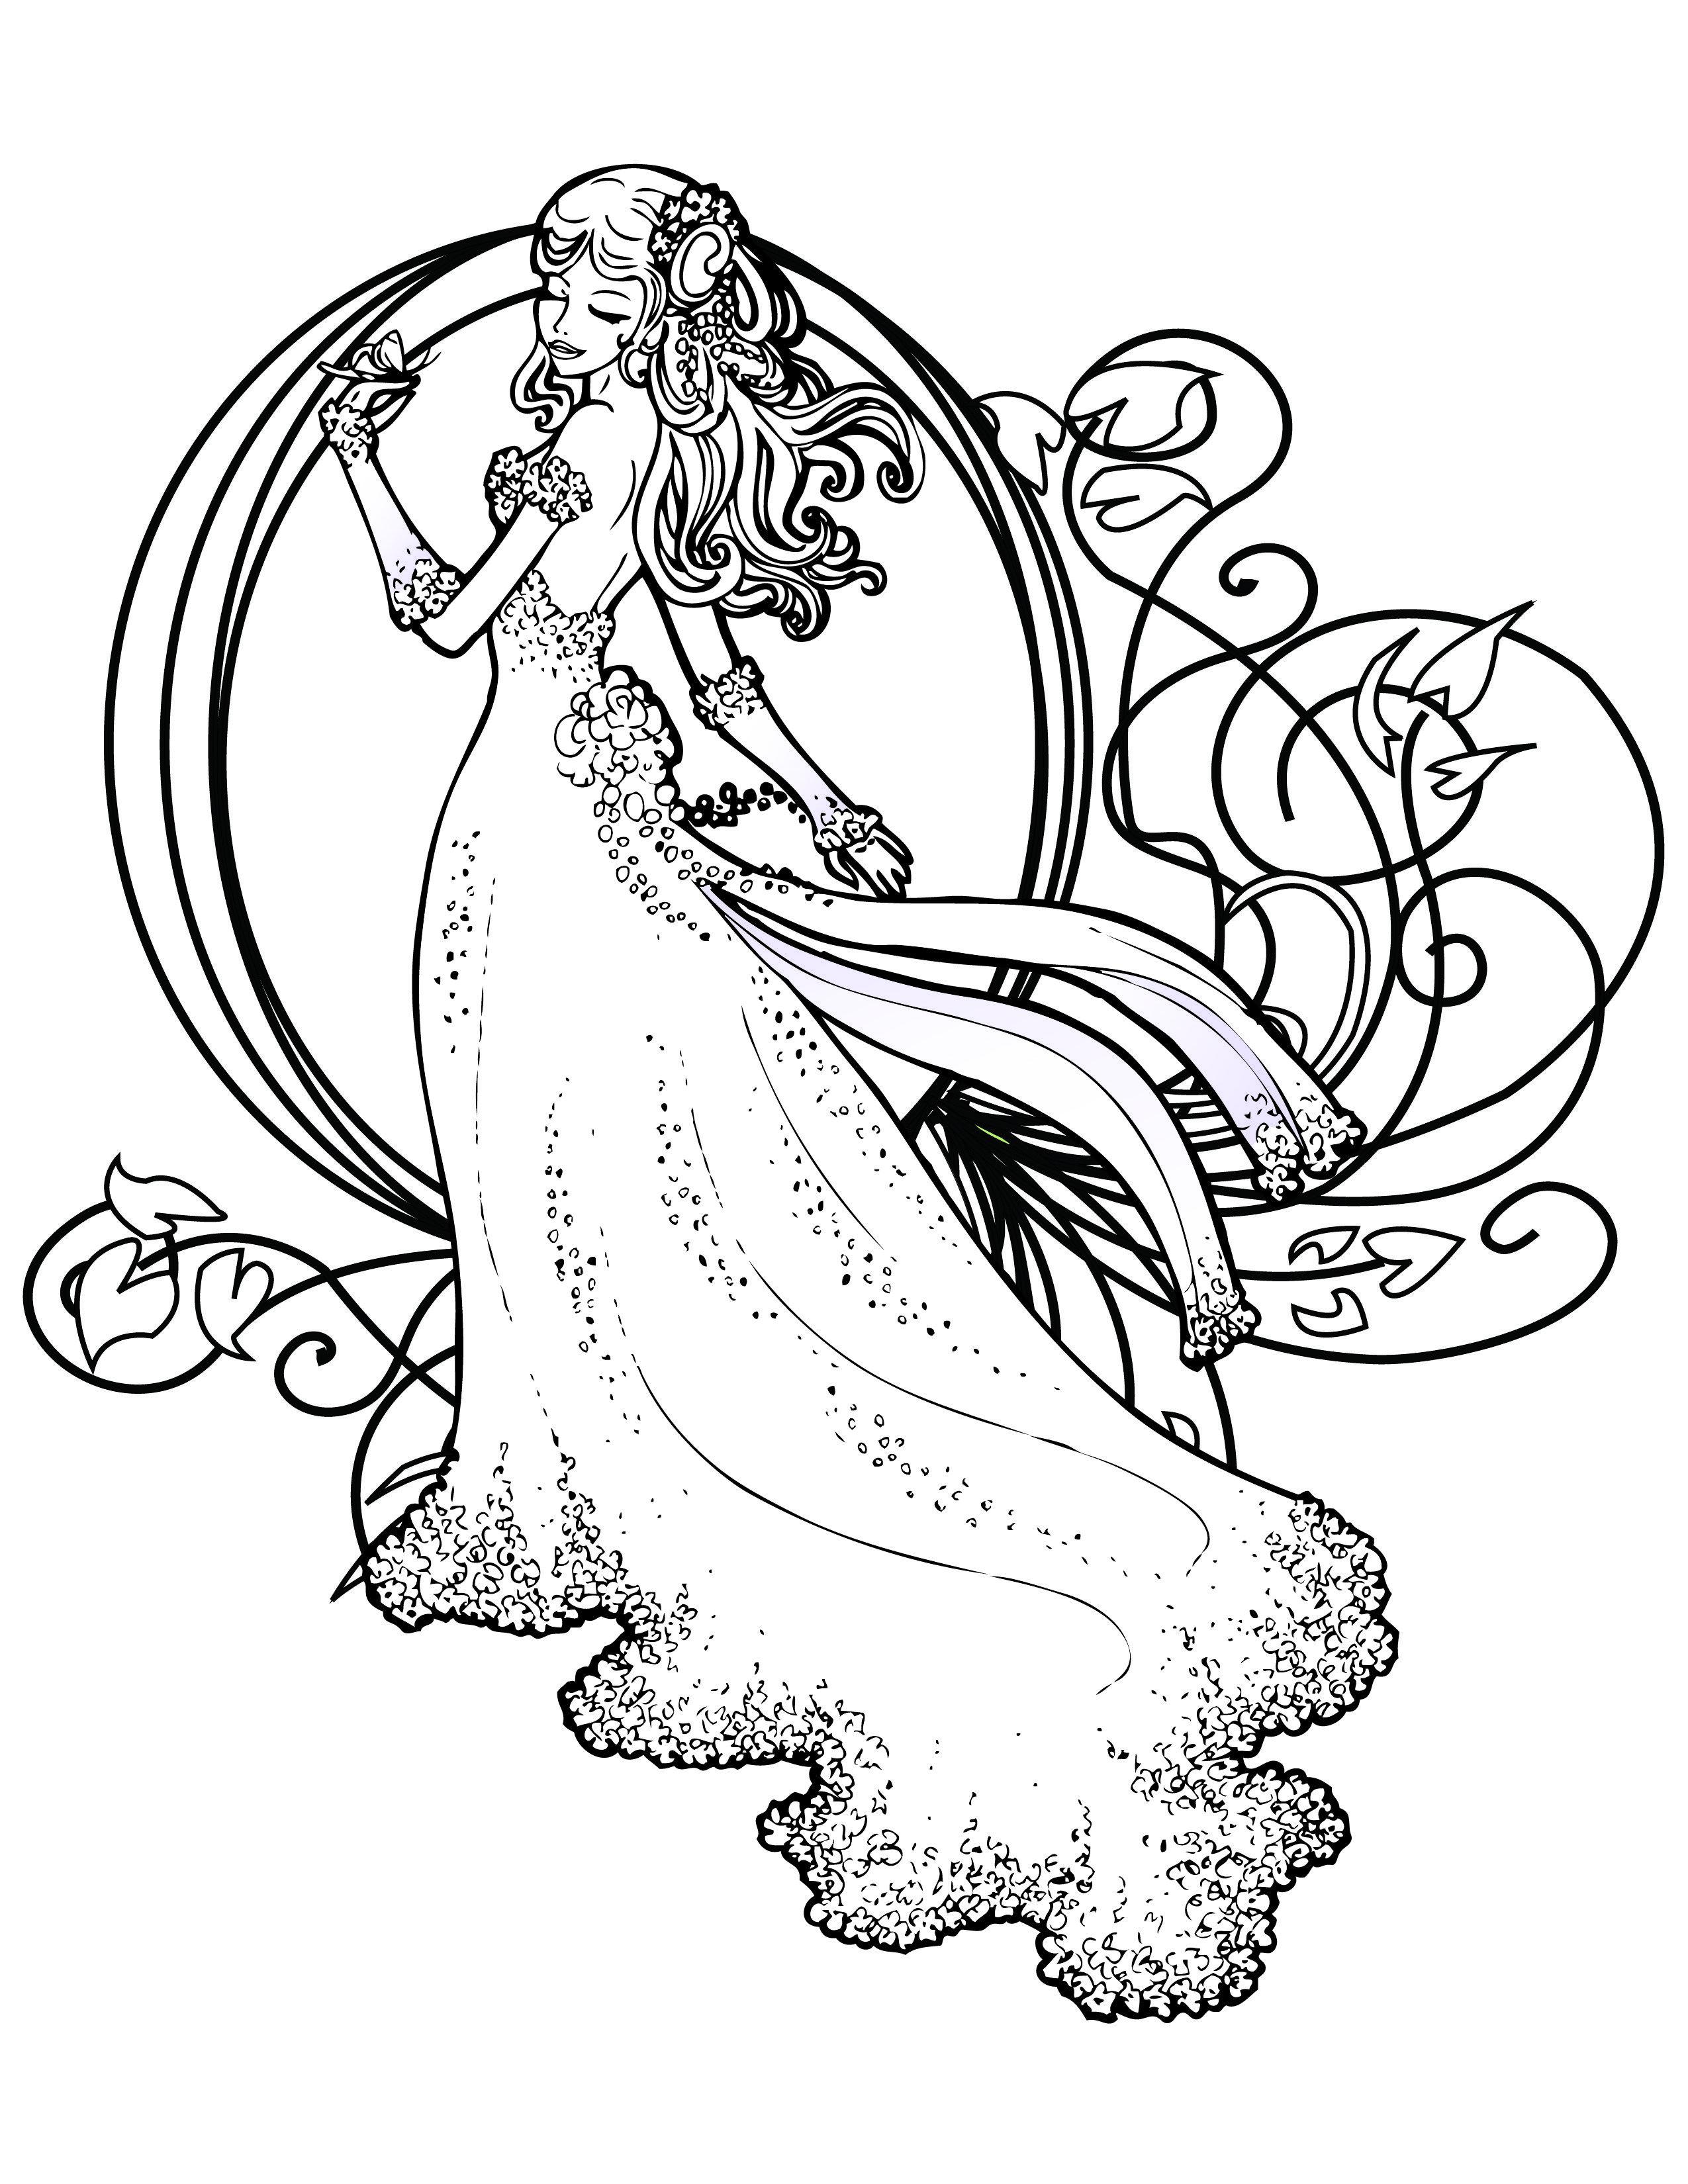 Coloriage De Princesse Disney Gratuit À Imprimer tout Coloriage Zebre A Imprimer Gratuit